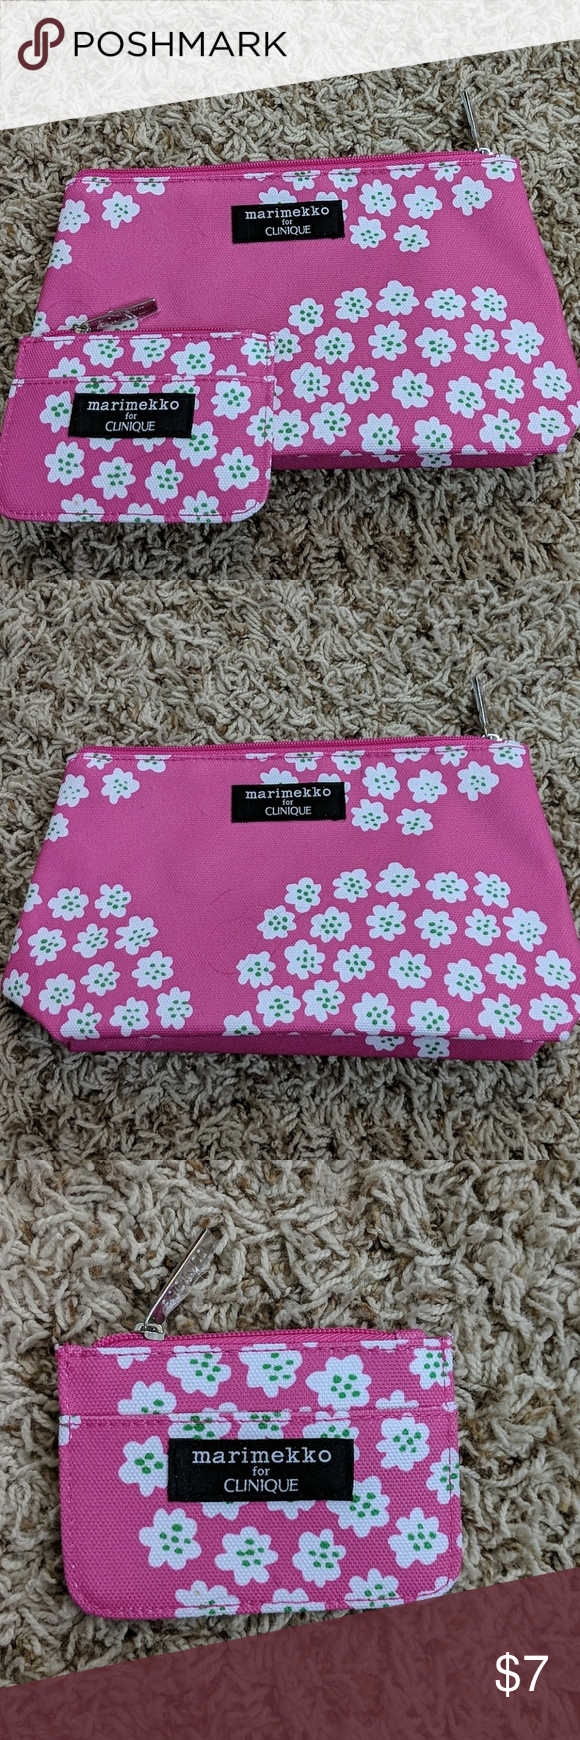 Marimekko For Clinique Pink Floral Makeup Bag Marimekko For